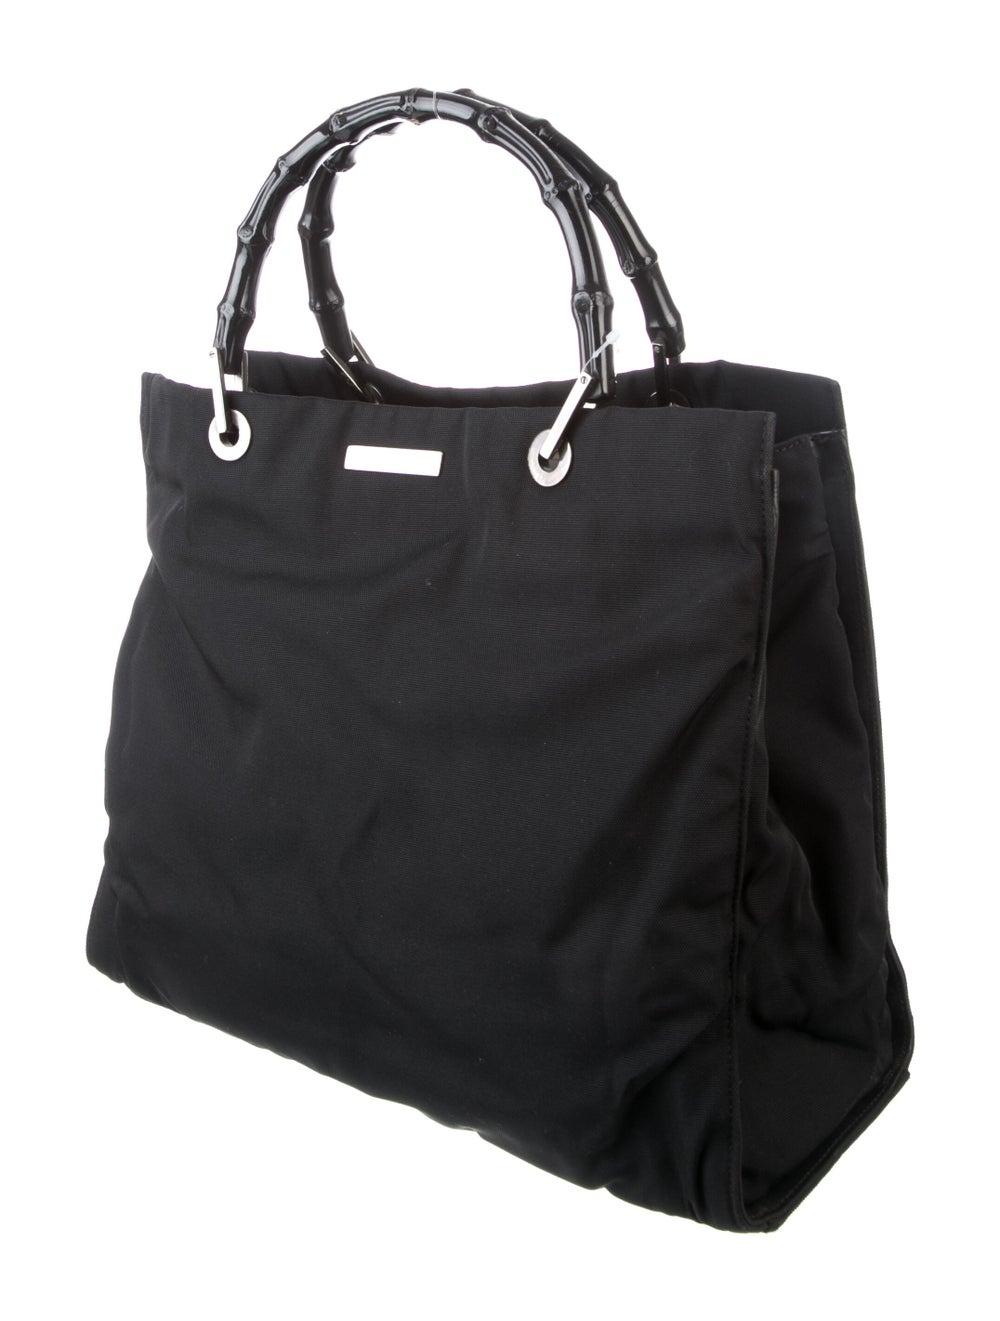 Gucci Vintage Nylon Bamboo Handle Bag Black - image 3